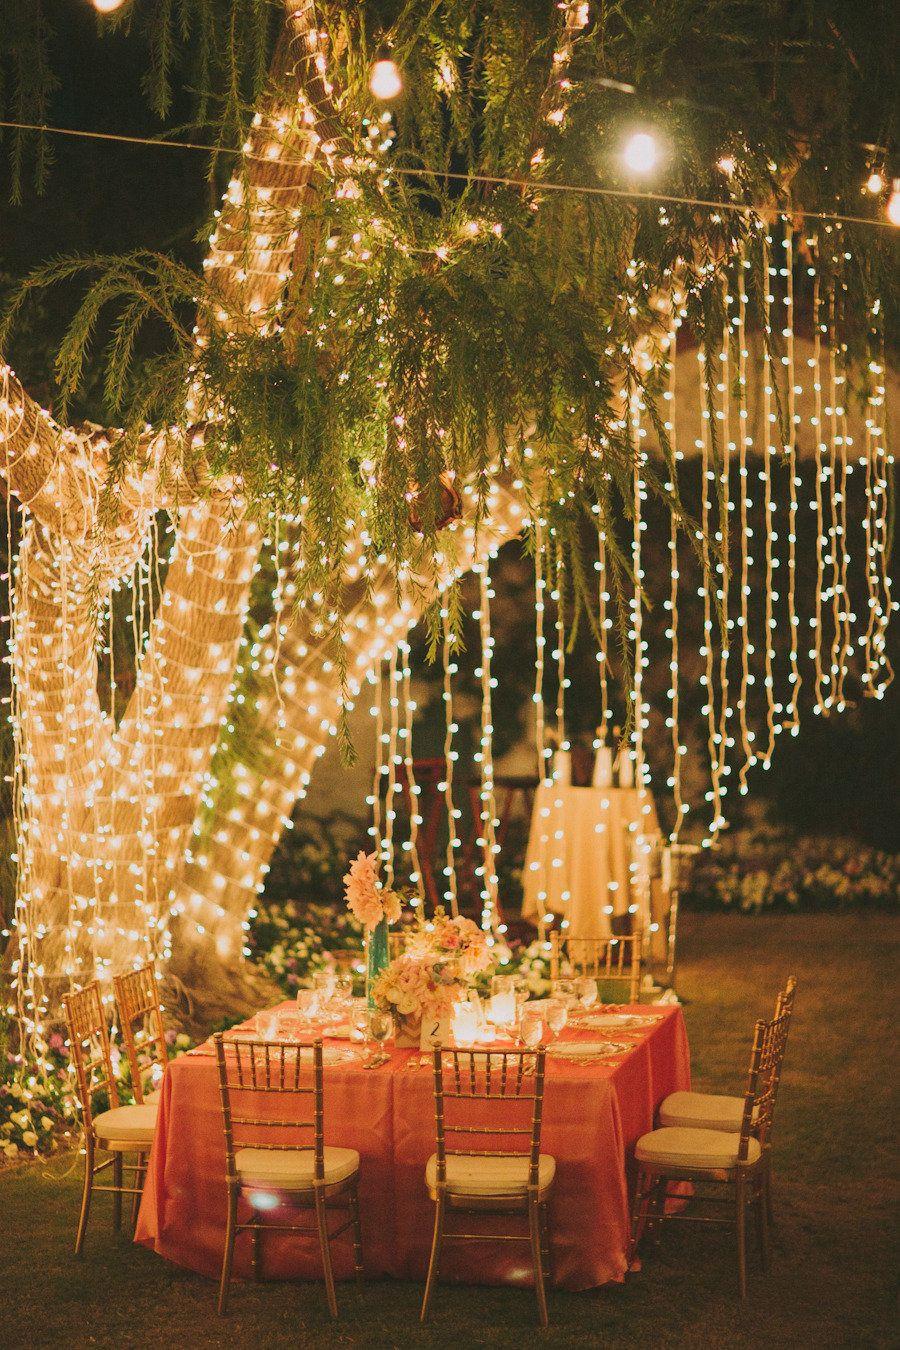 Lighting Al Fresco Outdoor Dinner Party Photography